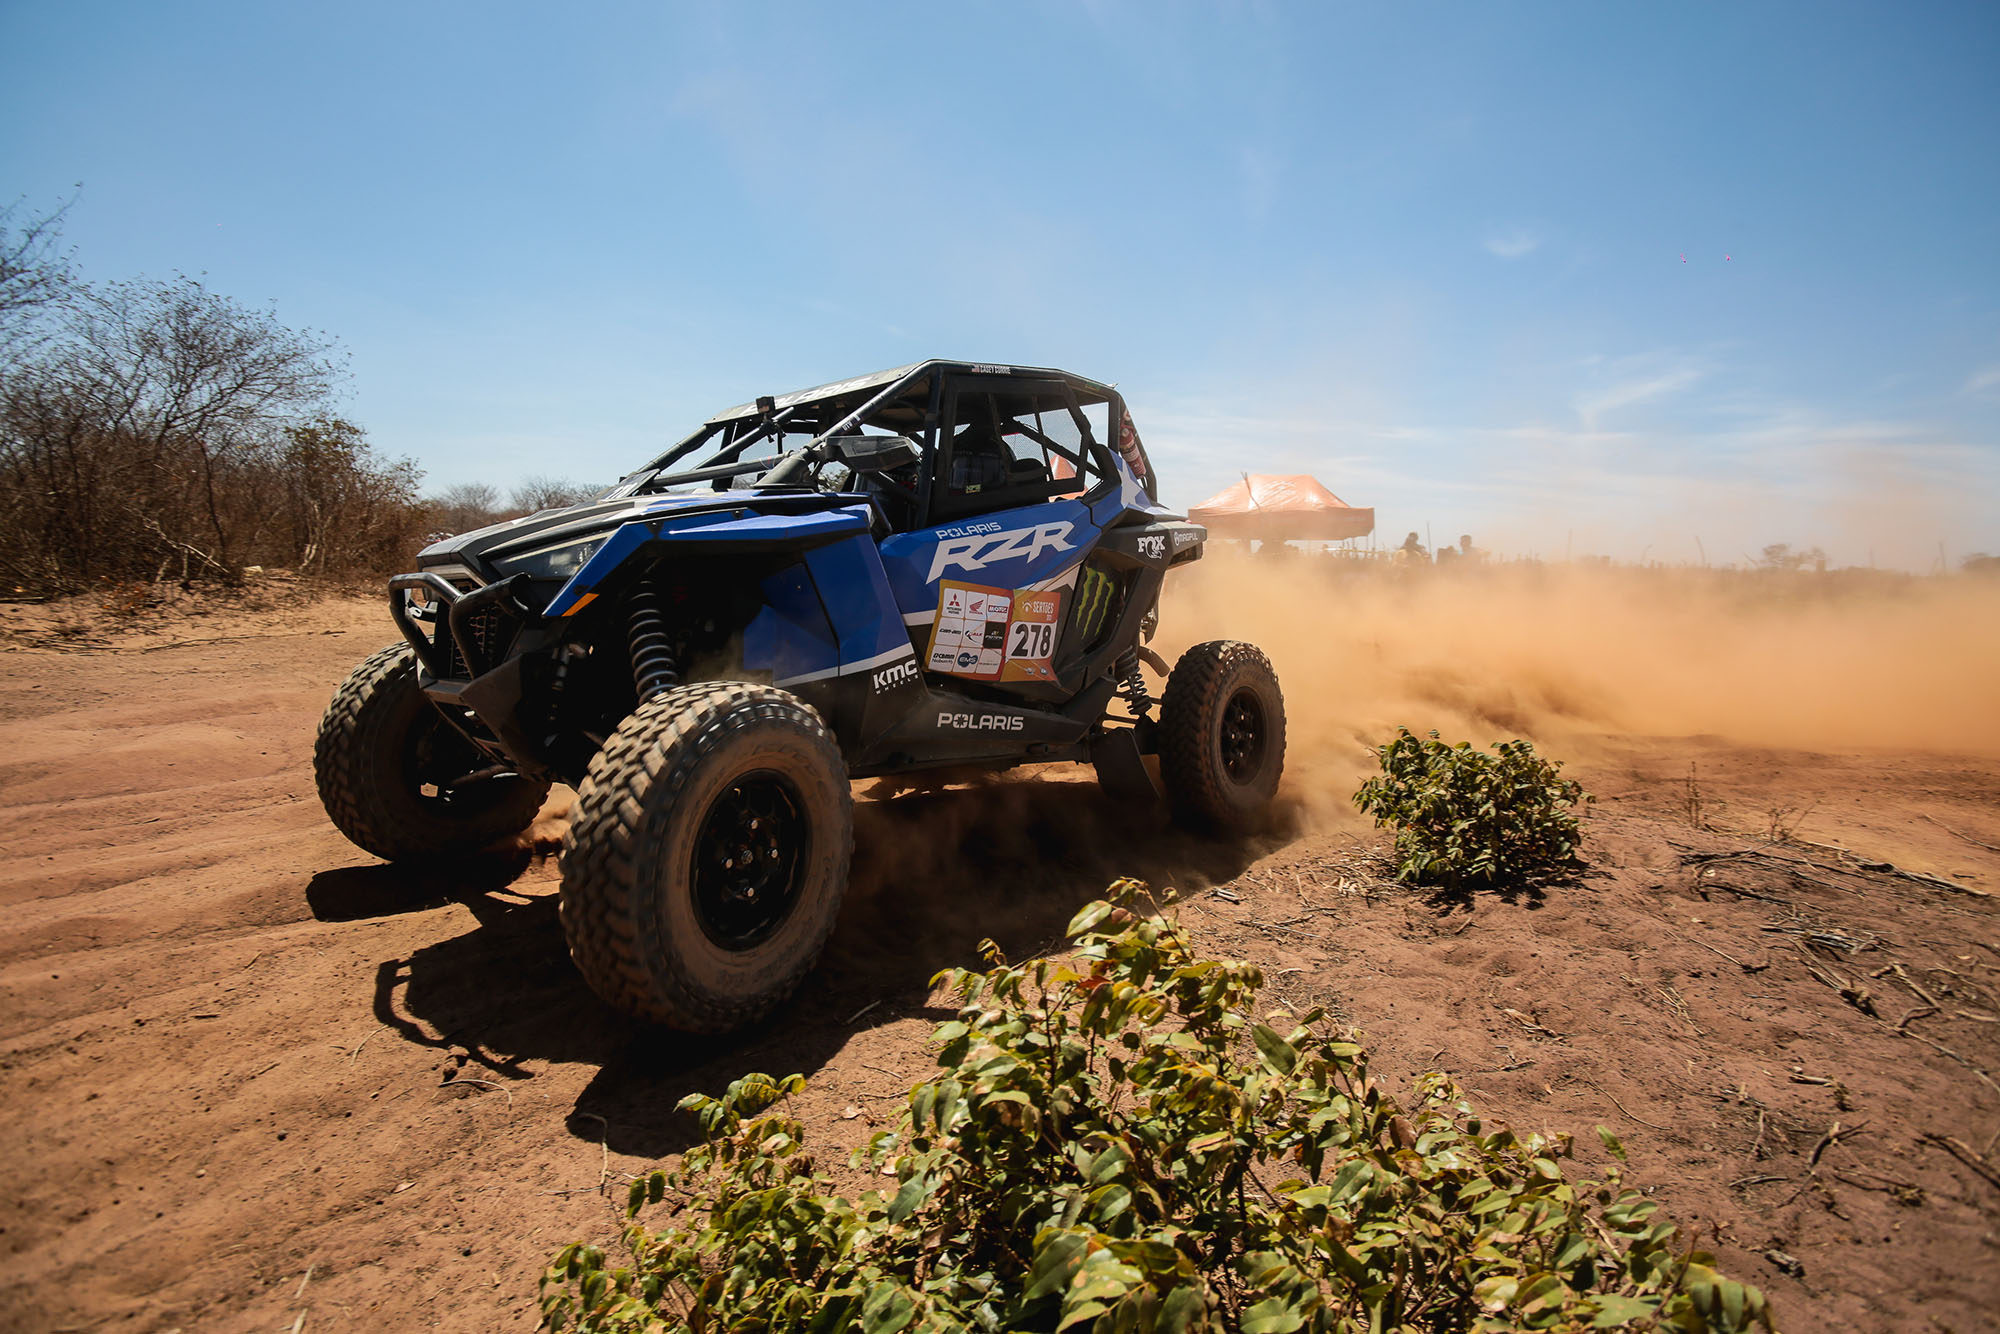 2021_Casey-Currie_Sertoes-Rally_Brazil_PolarisRZR_Stage5_003.jpg